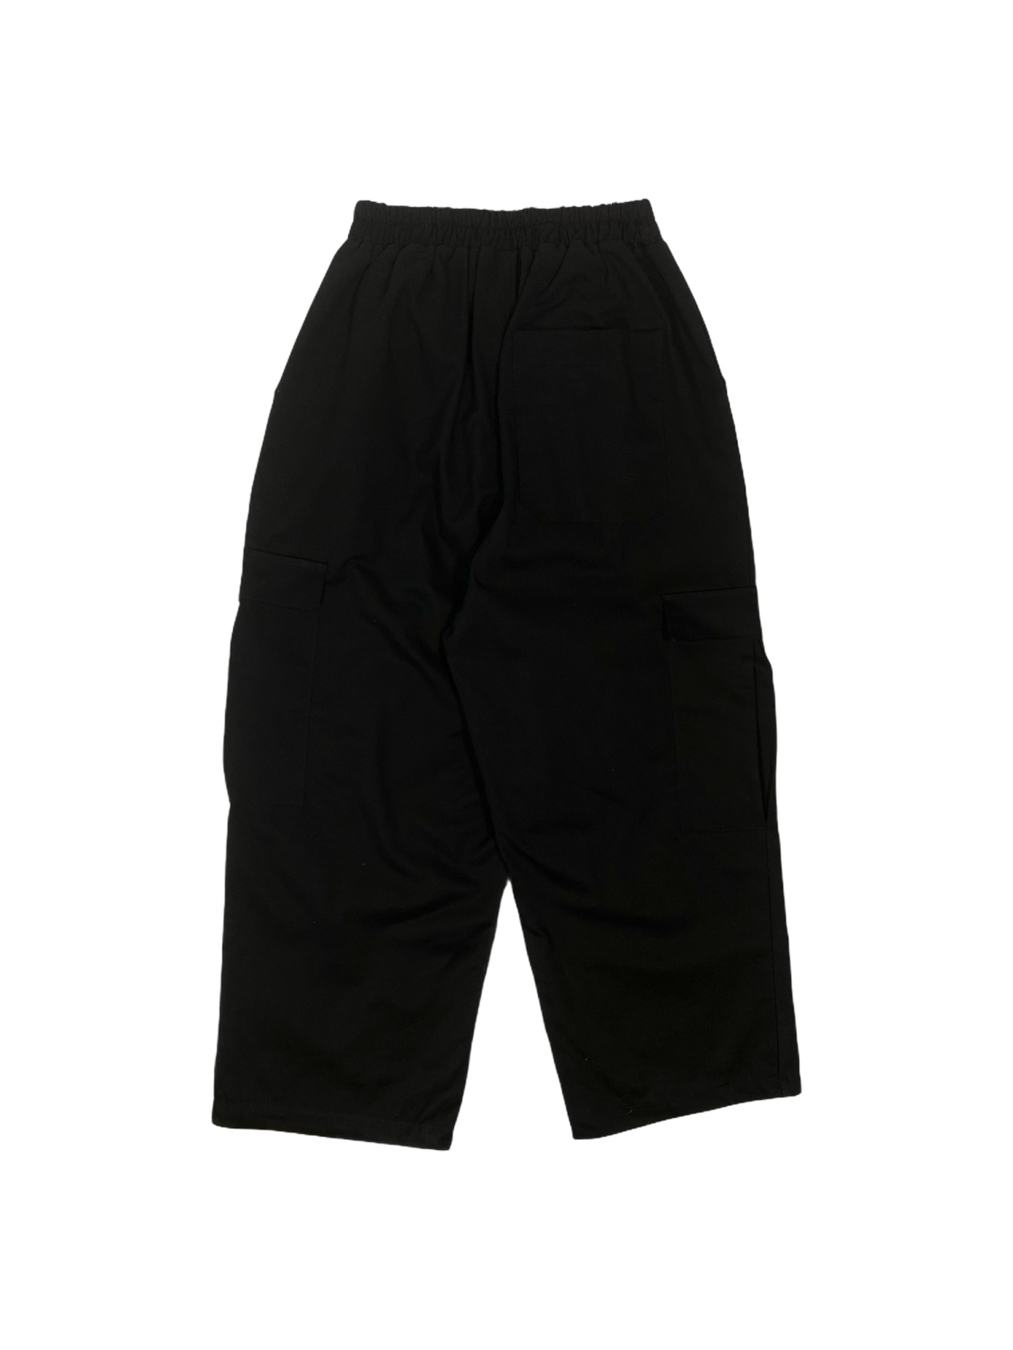 B & G Cargo Pants (Black)